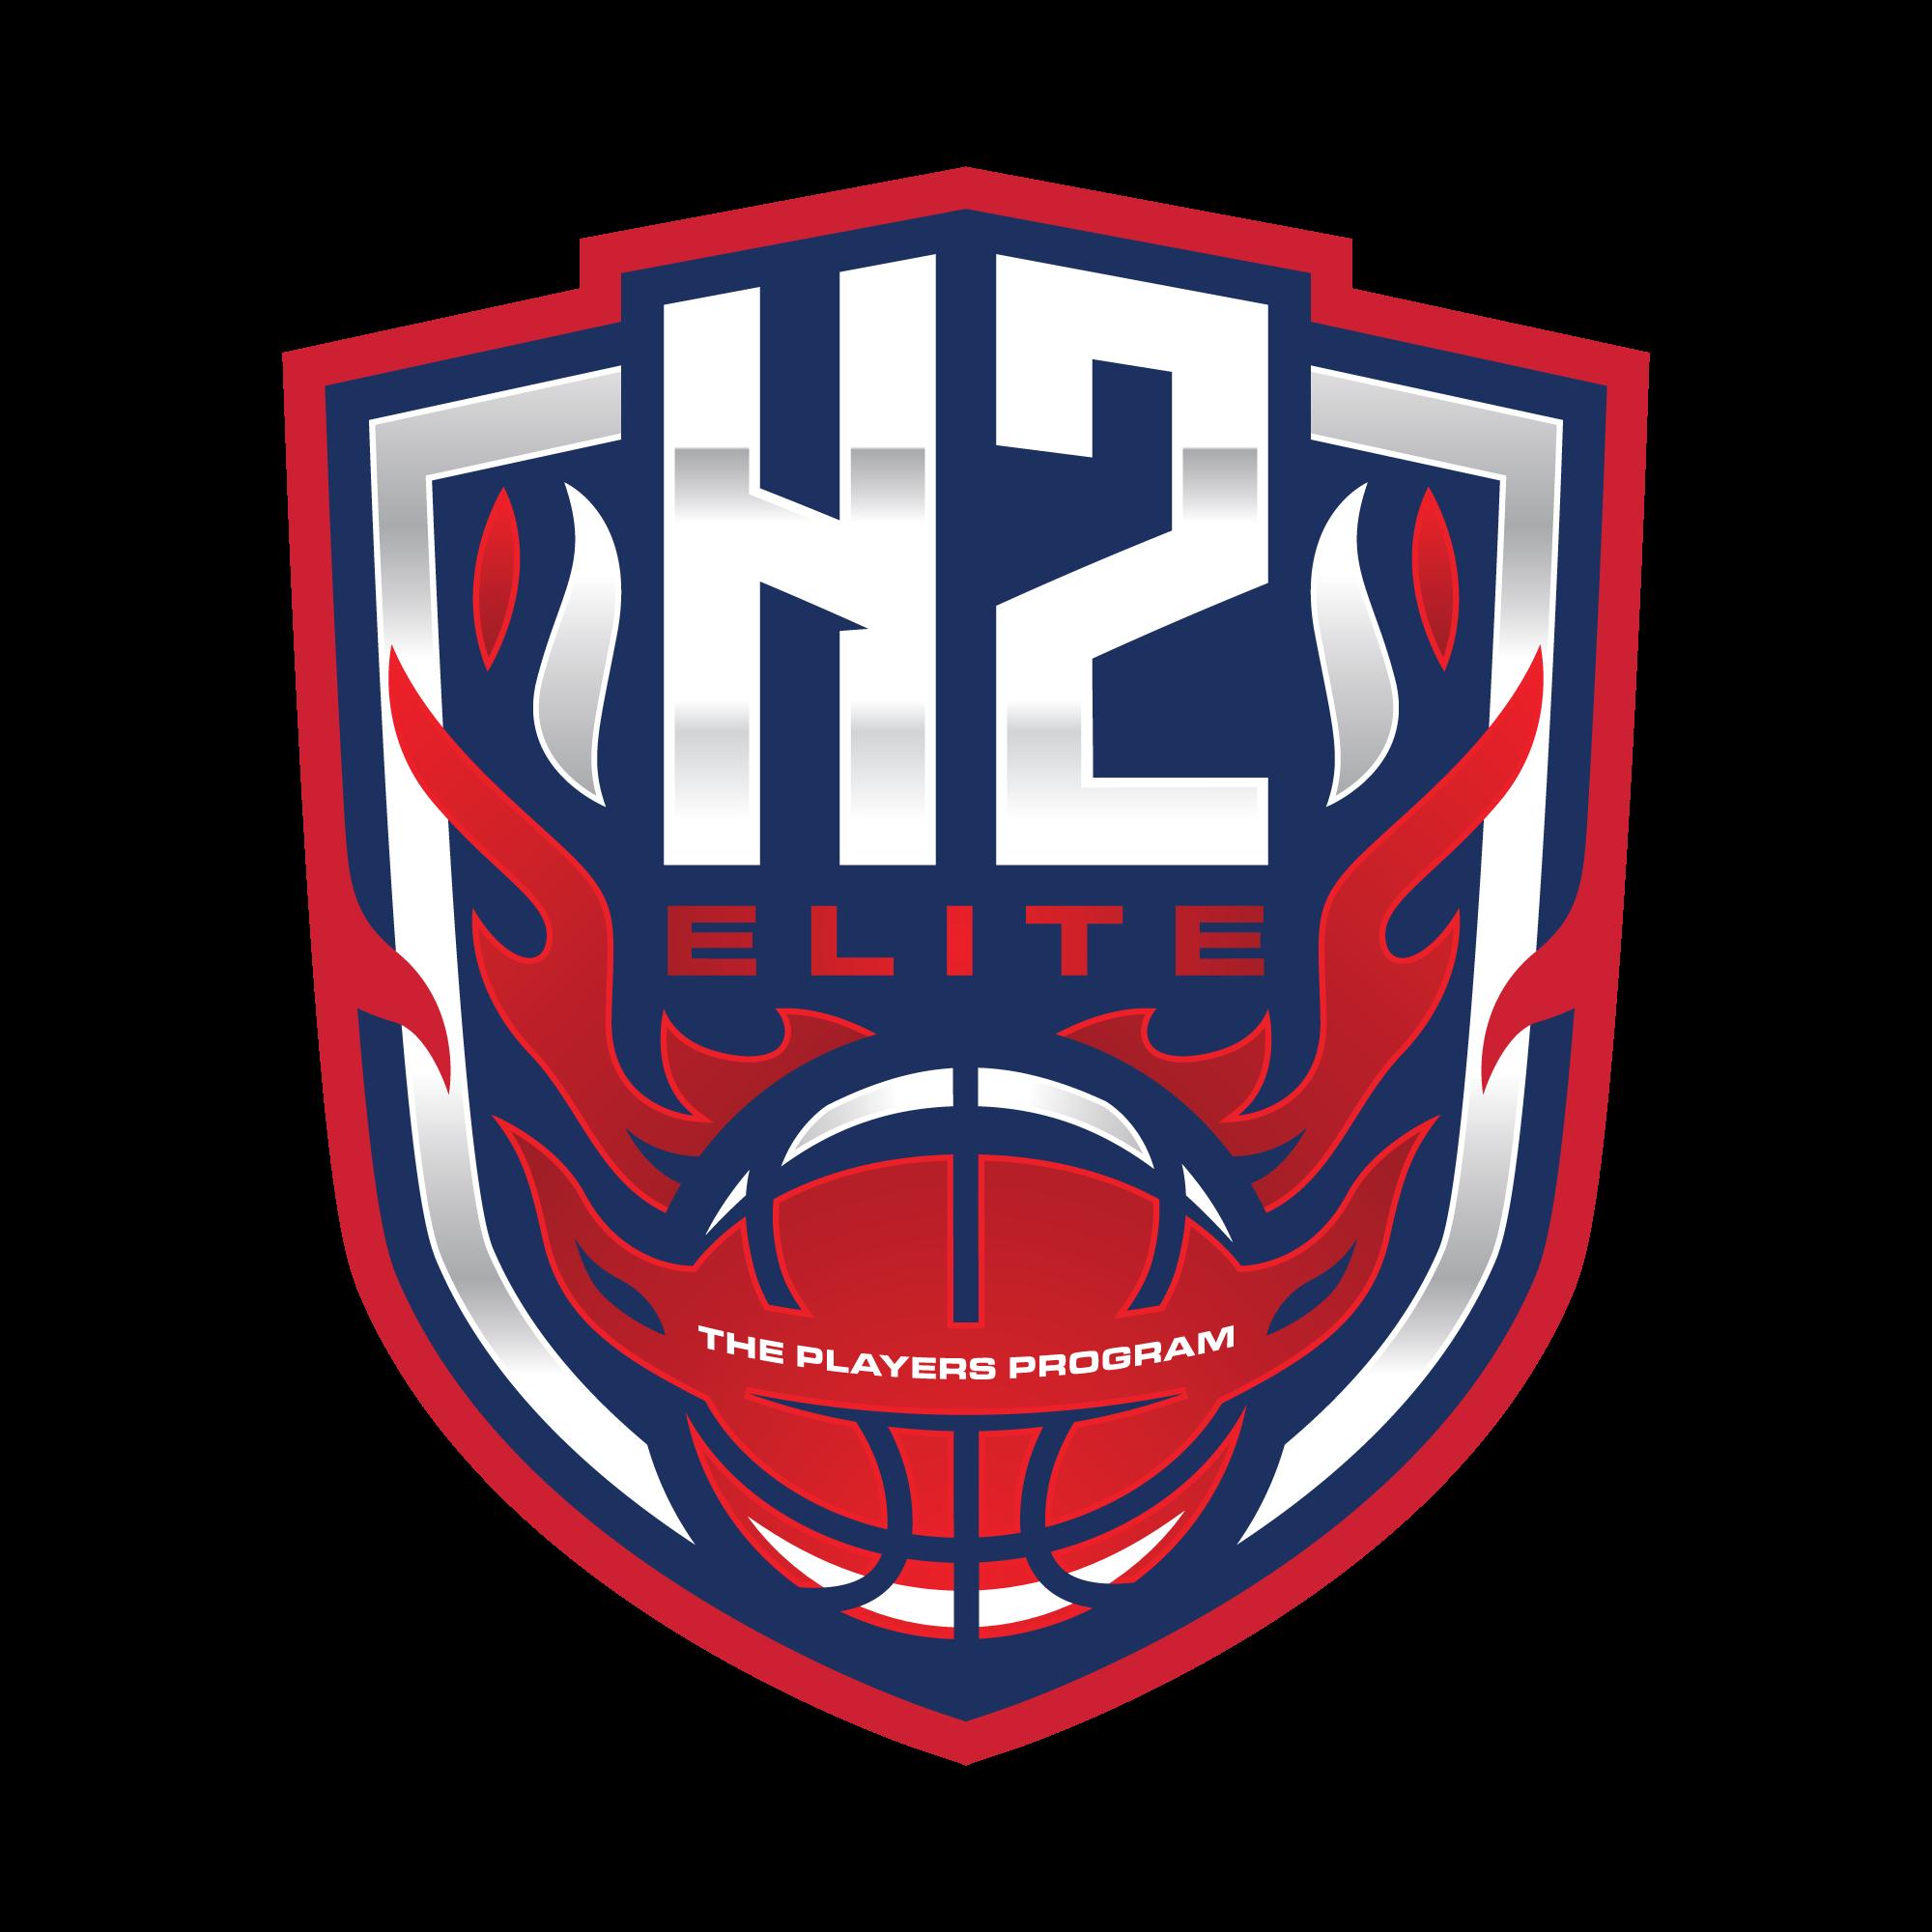 NBA Style basketball logo contest!